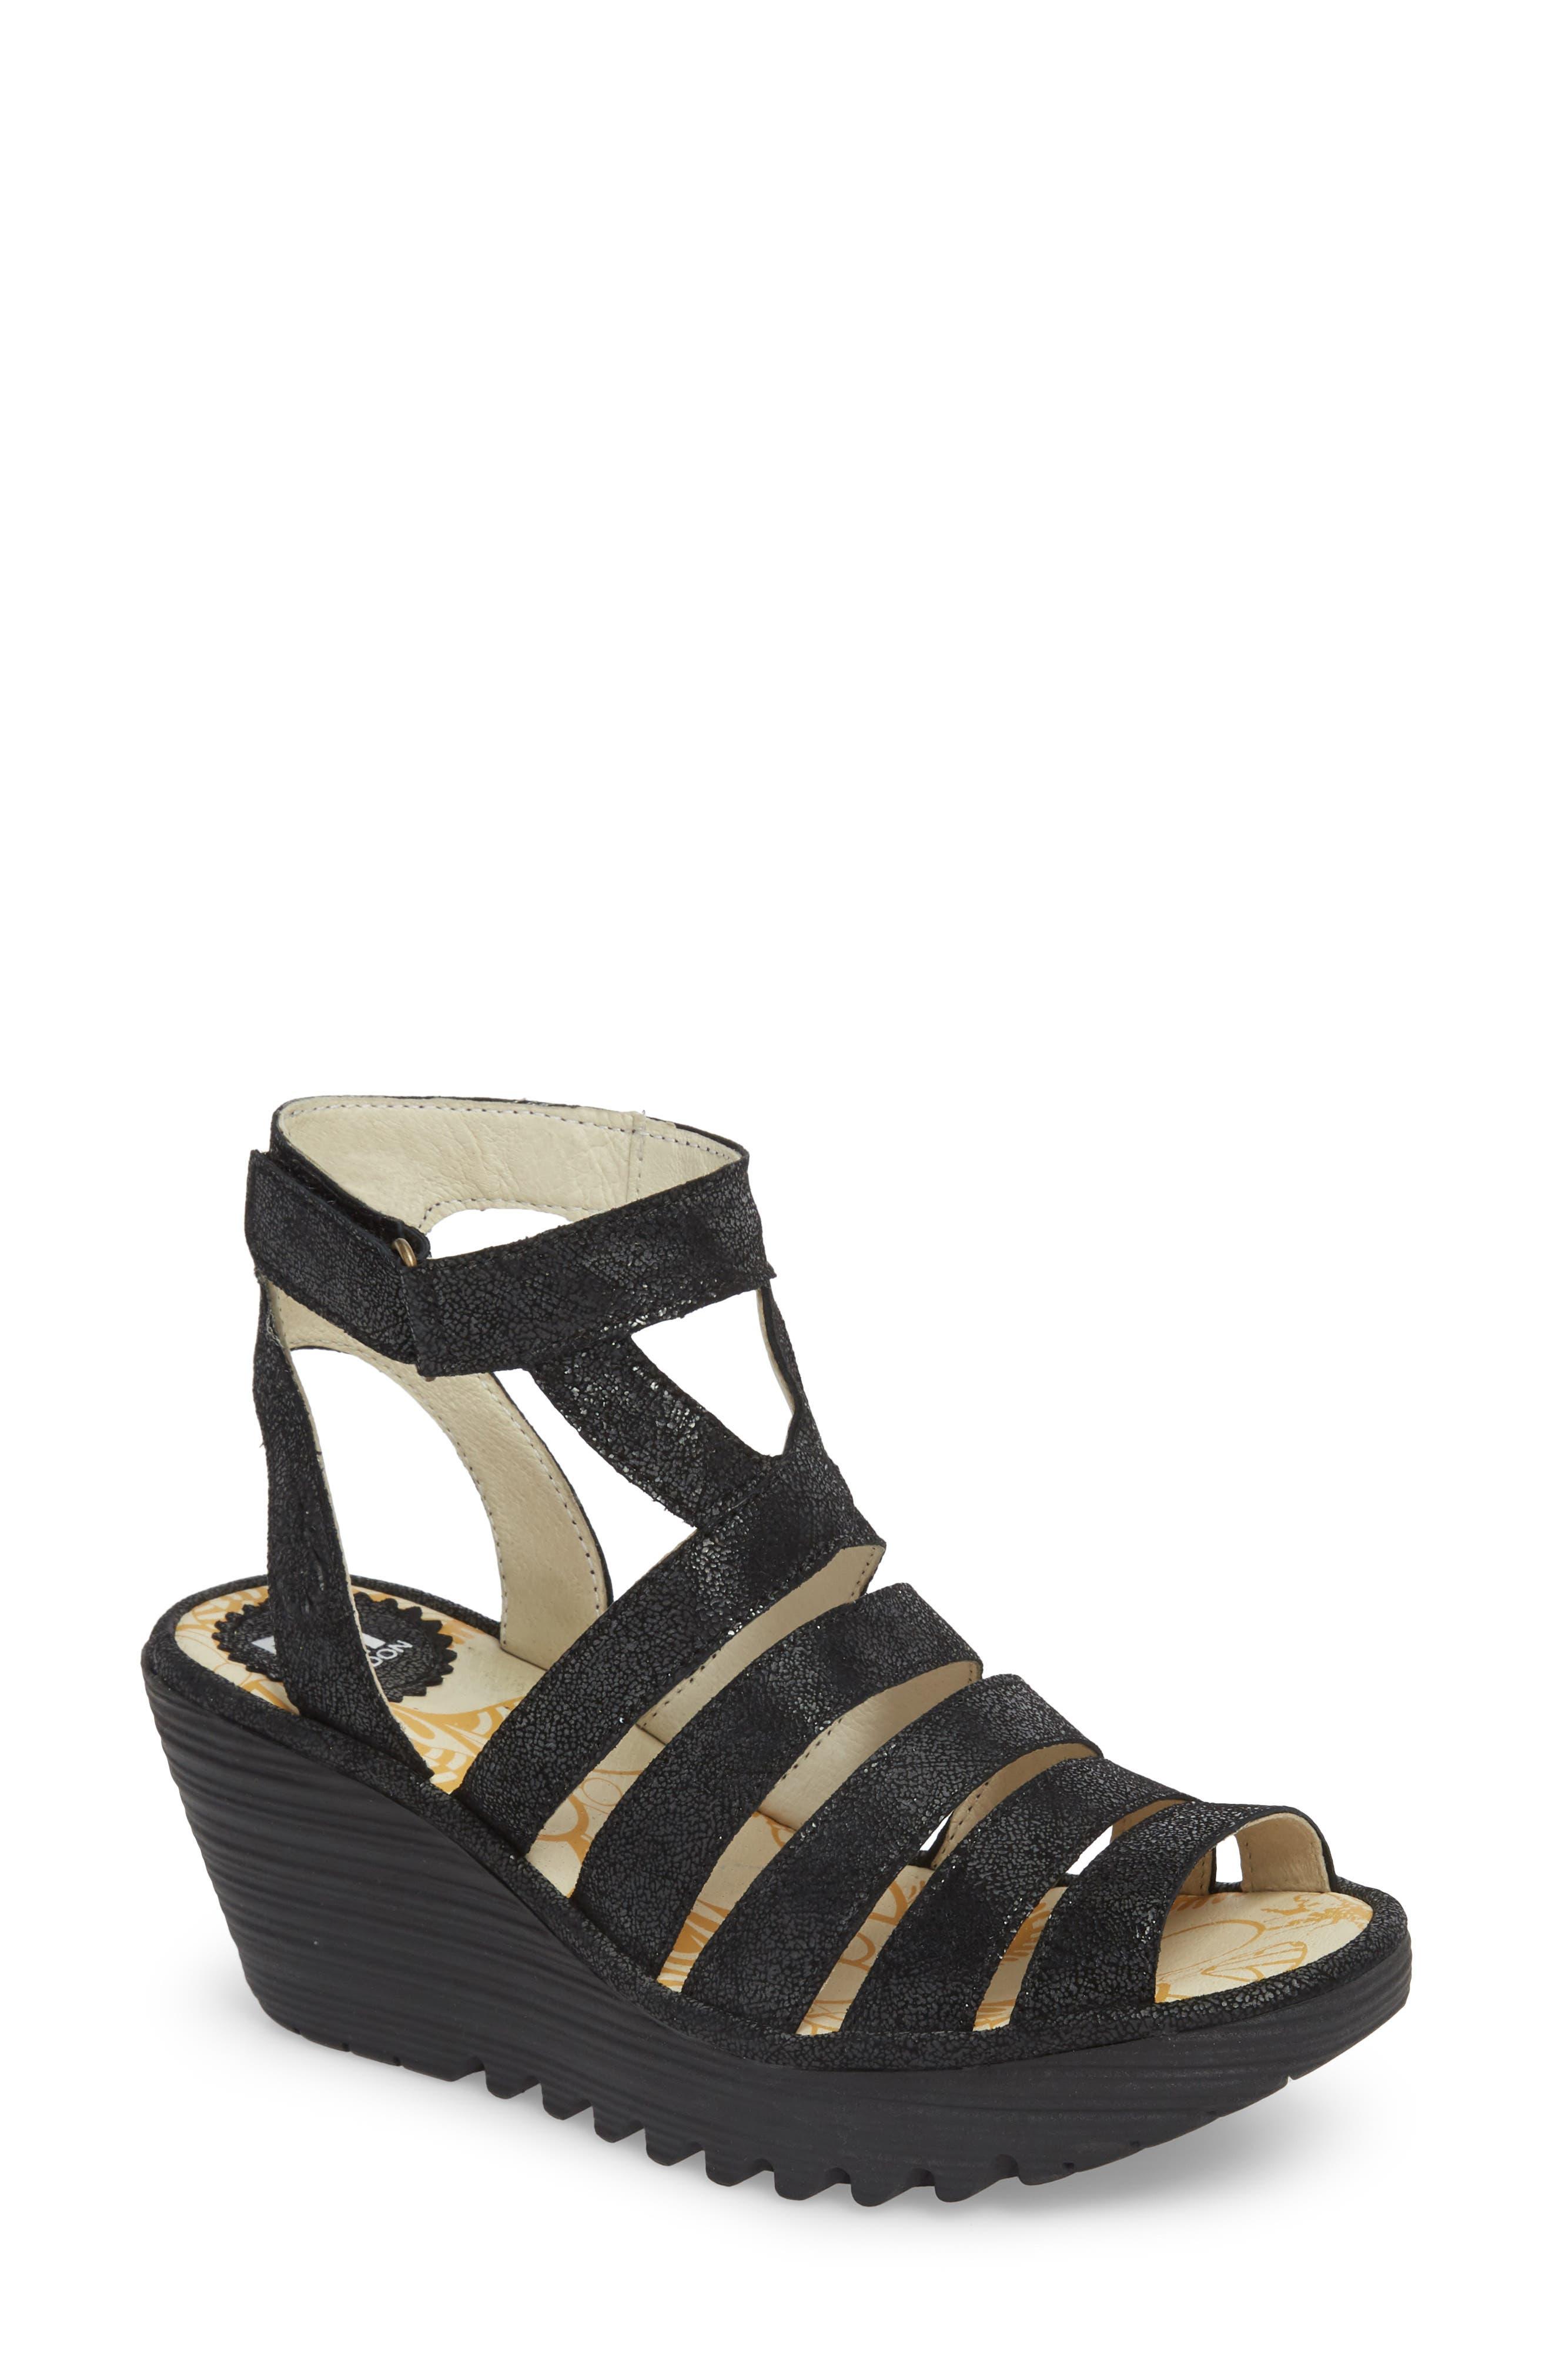 FLY LONDON Yeba Wedge Sandal, Main, color, BLACK LEATHER